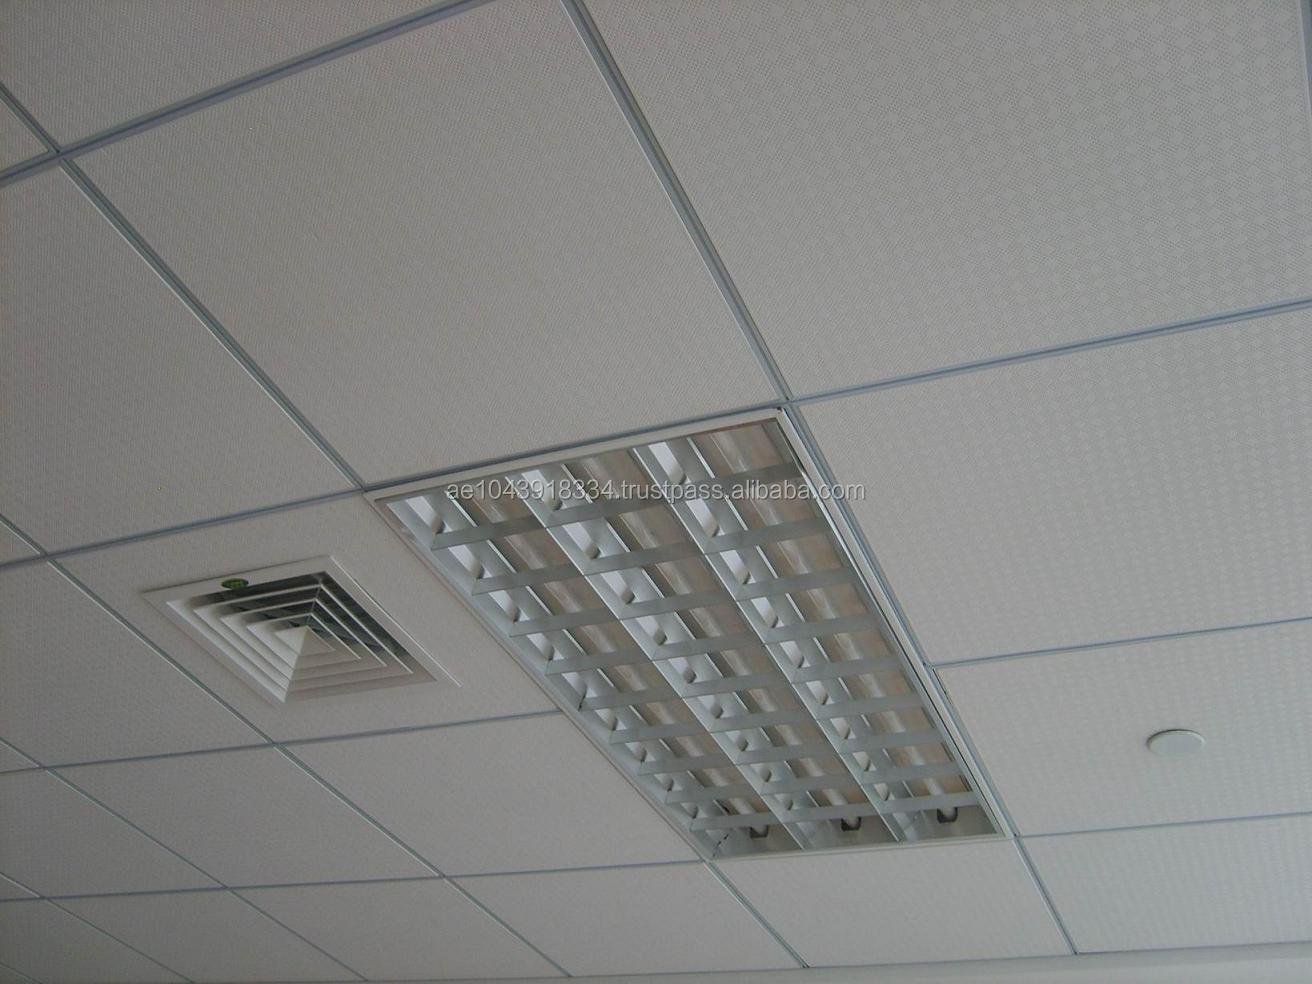 Pvc laminated gypsum ceiling tiles buy vinyl coated gypsum pvc laminated gypsum ceiling tiles dailygadgetfo Images